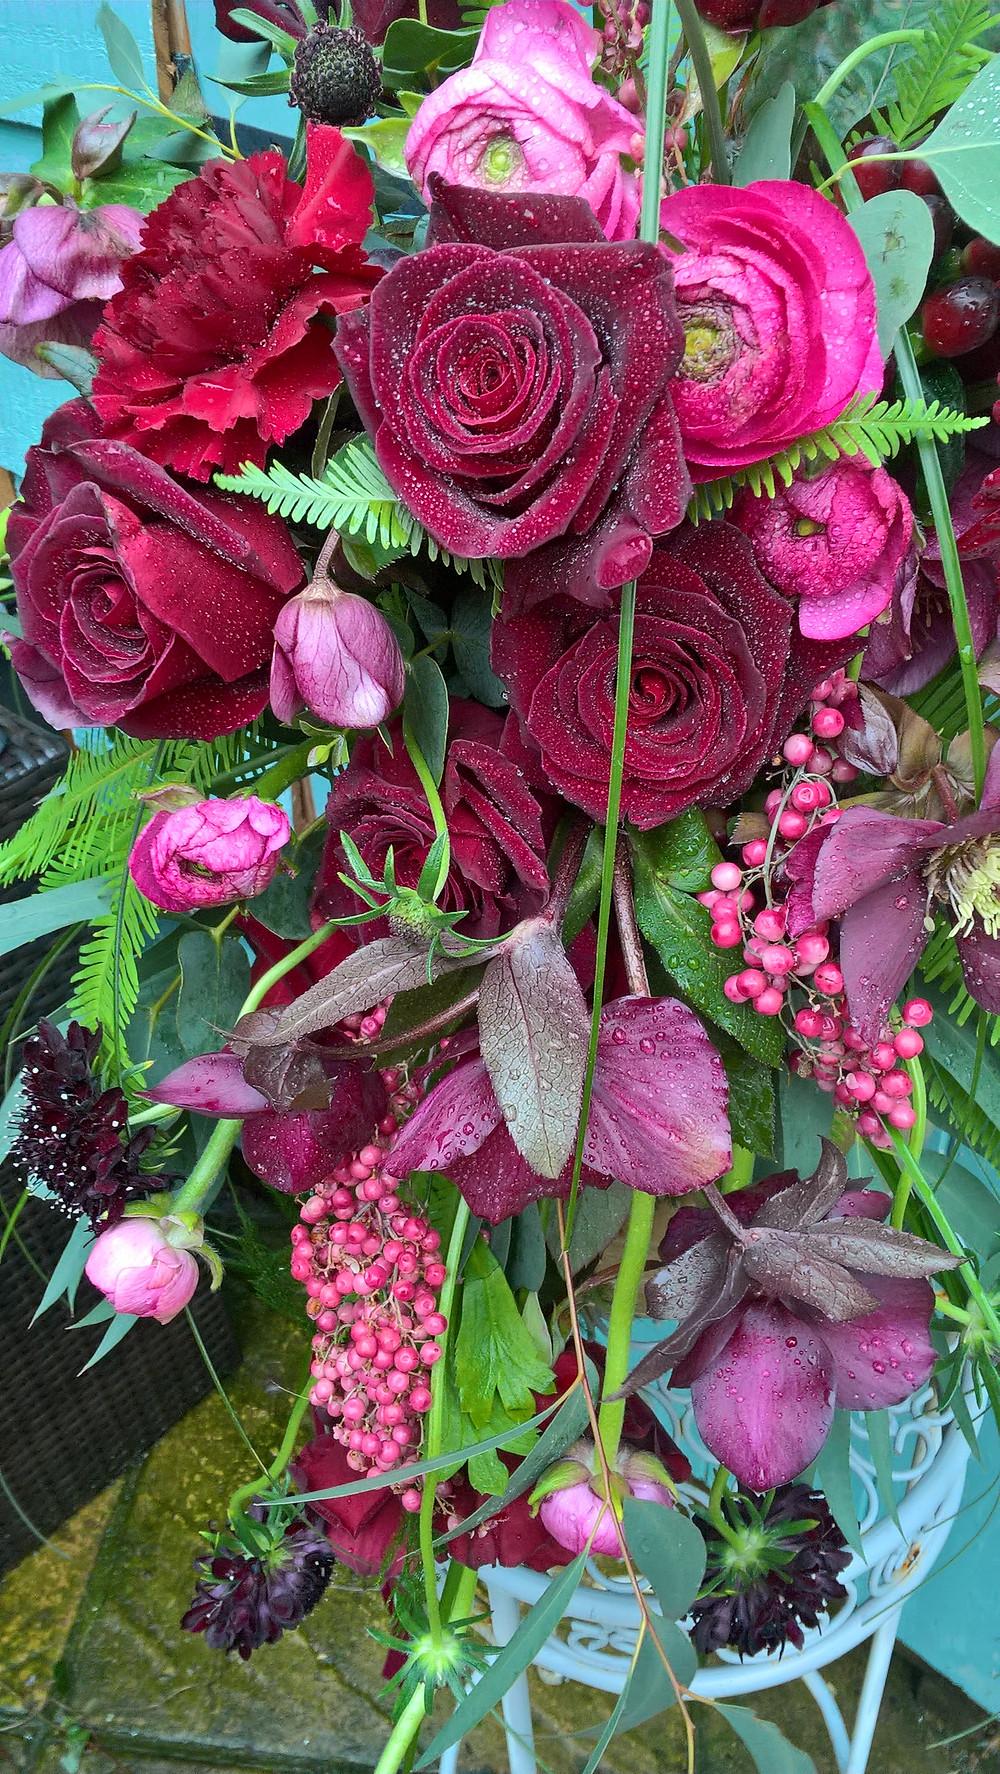 Freah red rose wedding bouquet